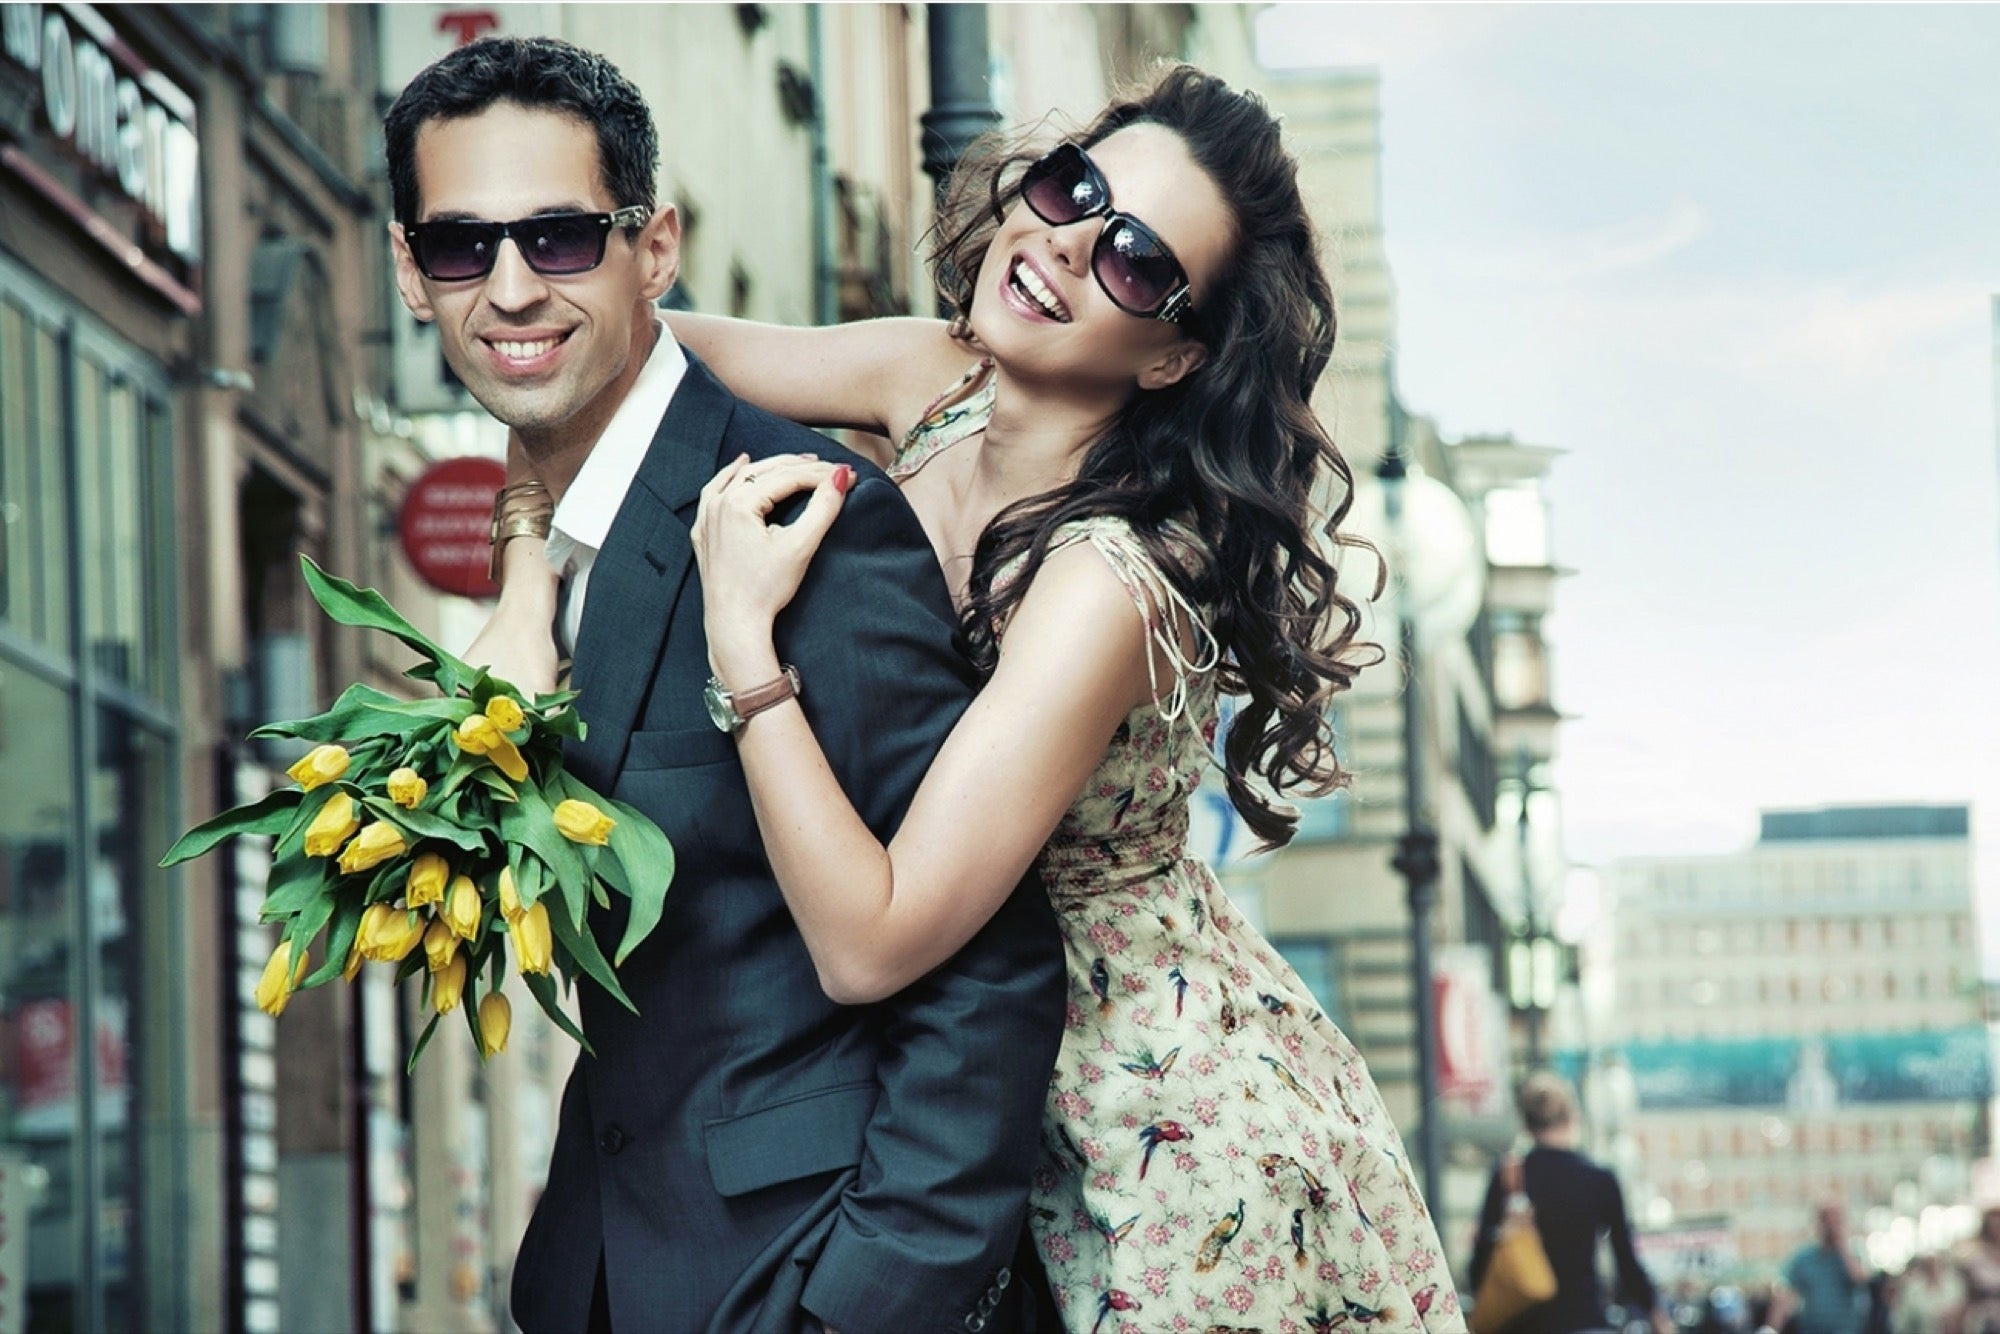 Samy Kamkar online dating